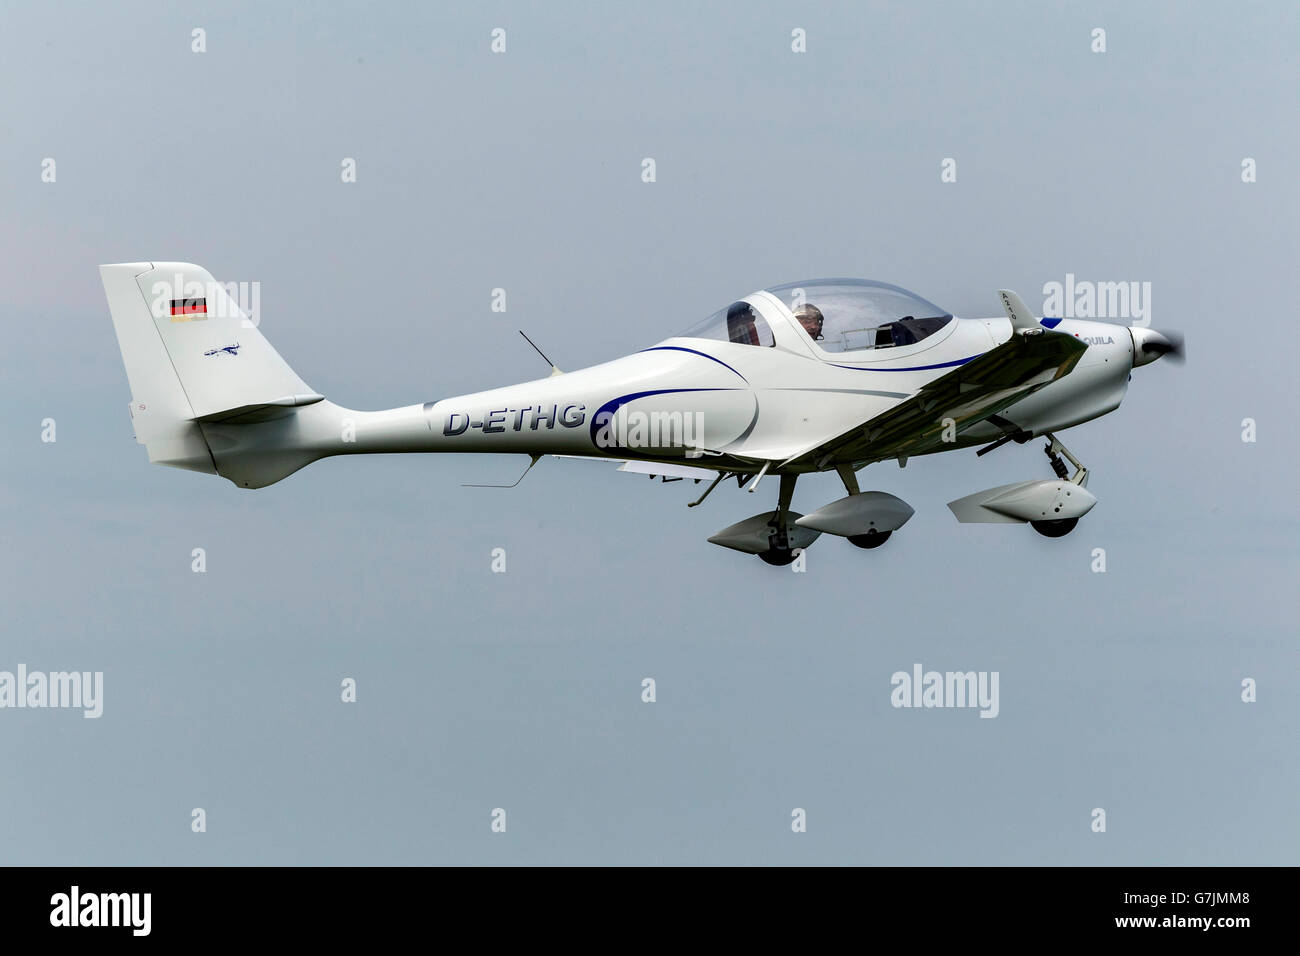 Aerial view, airfield Hamm start a single-seater AQUILA, light aircraft, Hamm, Ruhr area, North Rhine-Westphalia, - Stock Image